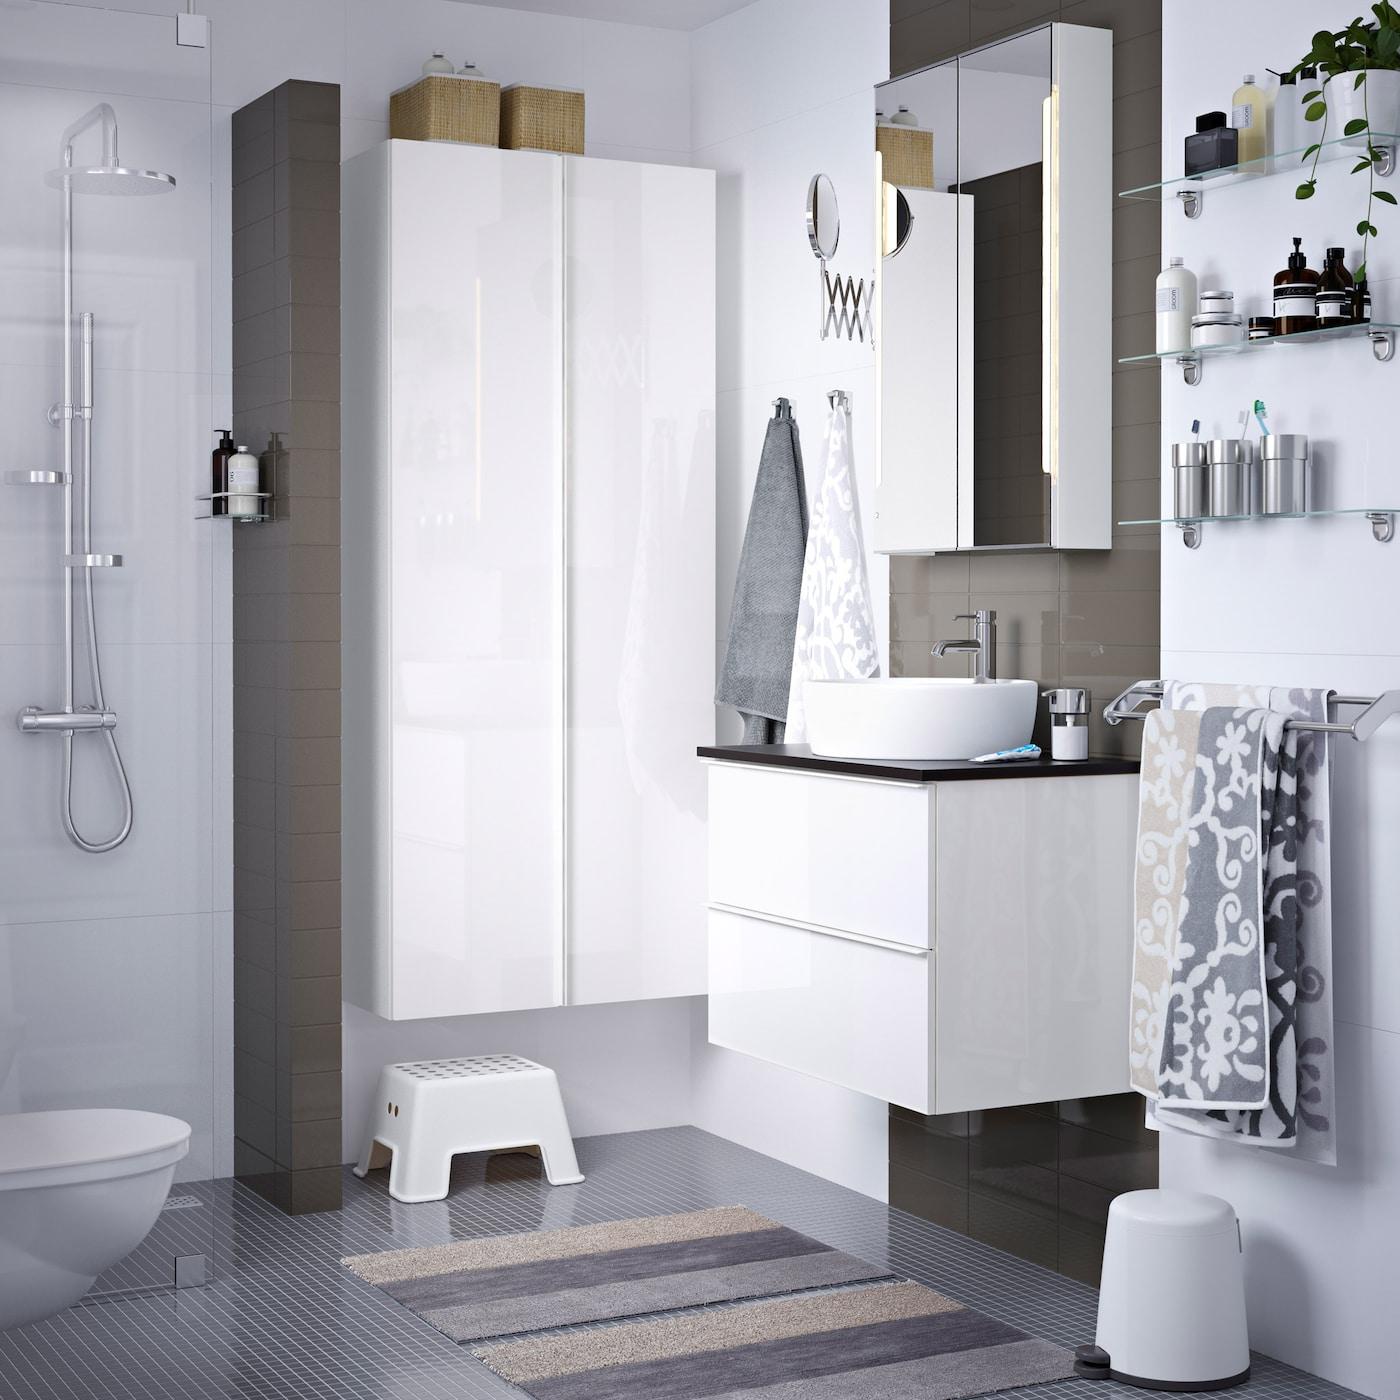 Badezimmer design einrichtungsideen ikea ikea for Badezimmer hochschrank ikea